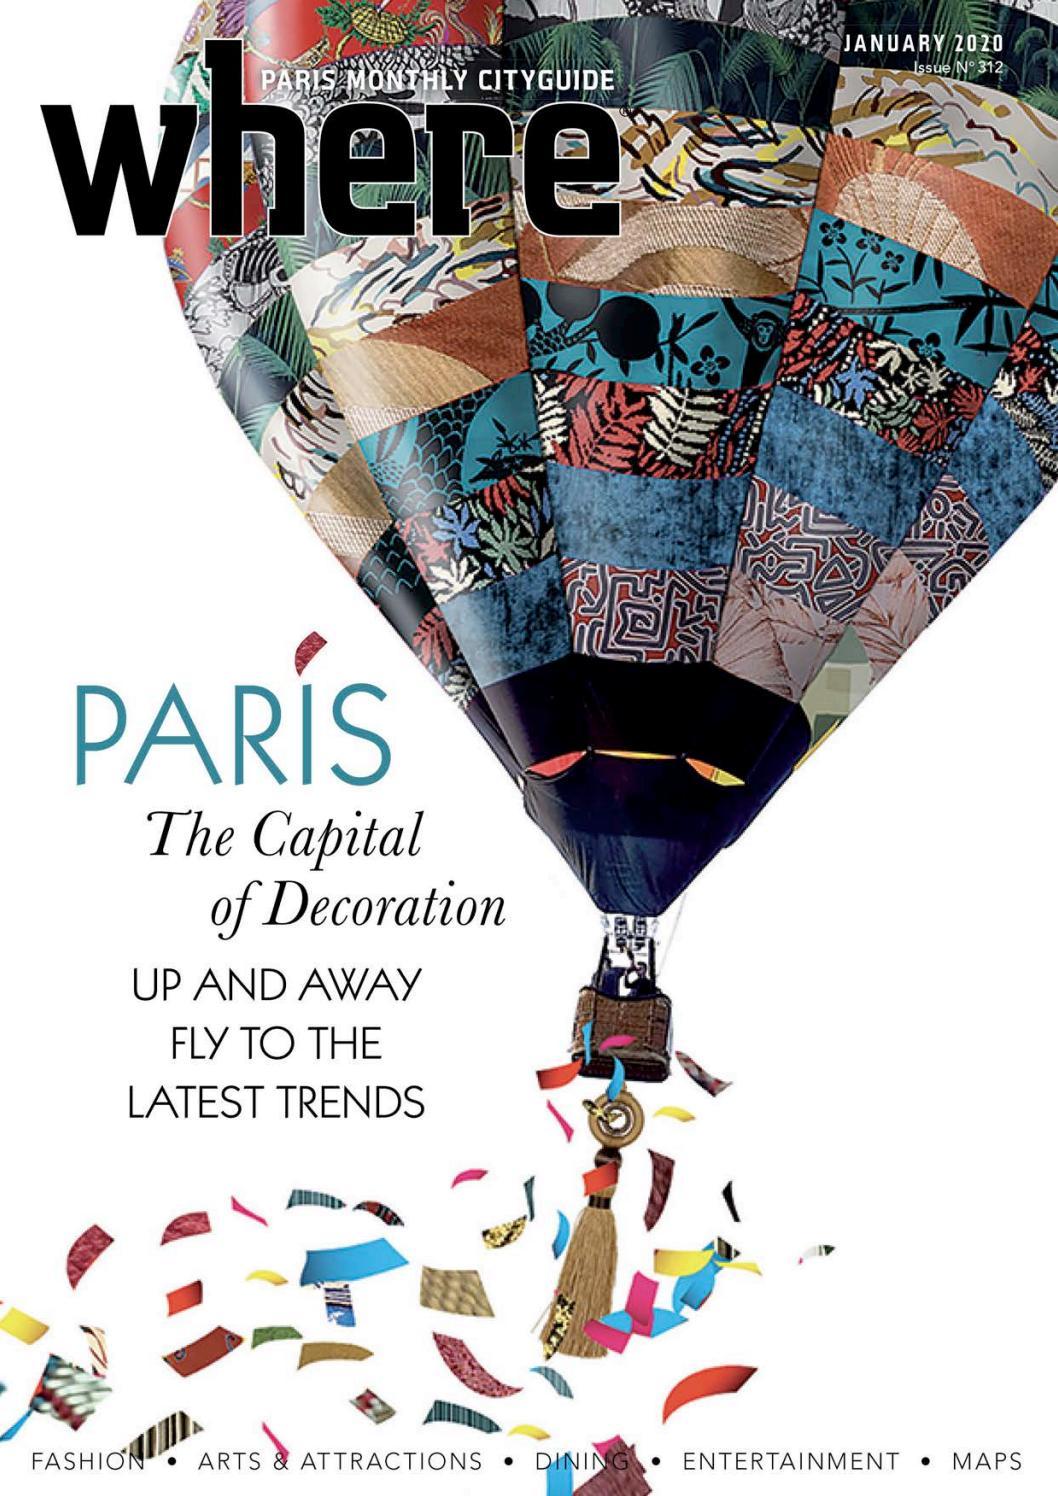 RUE DE RIVOLI /& PAVILLION MARSAN PARIS FRANCE PAINTING ART REAL CANVAS PRINT